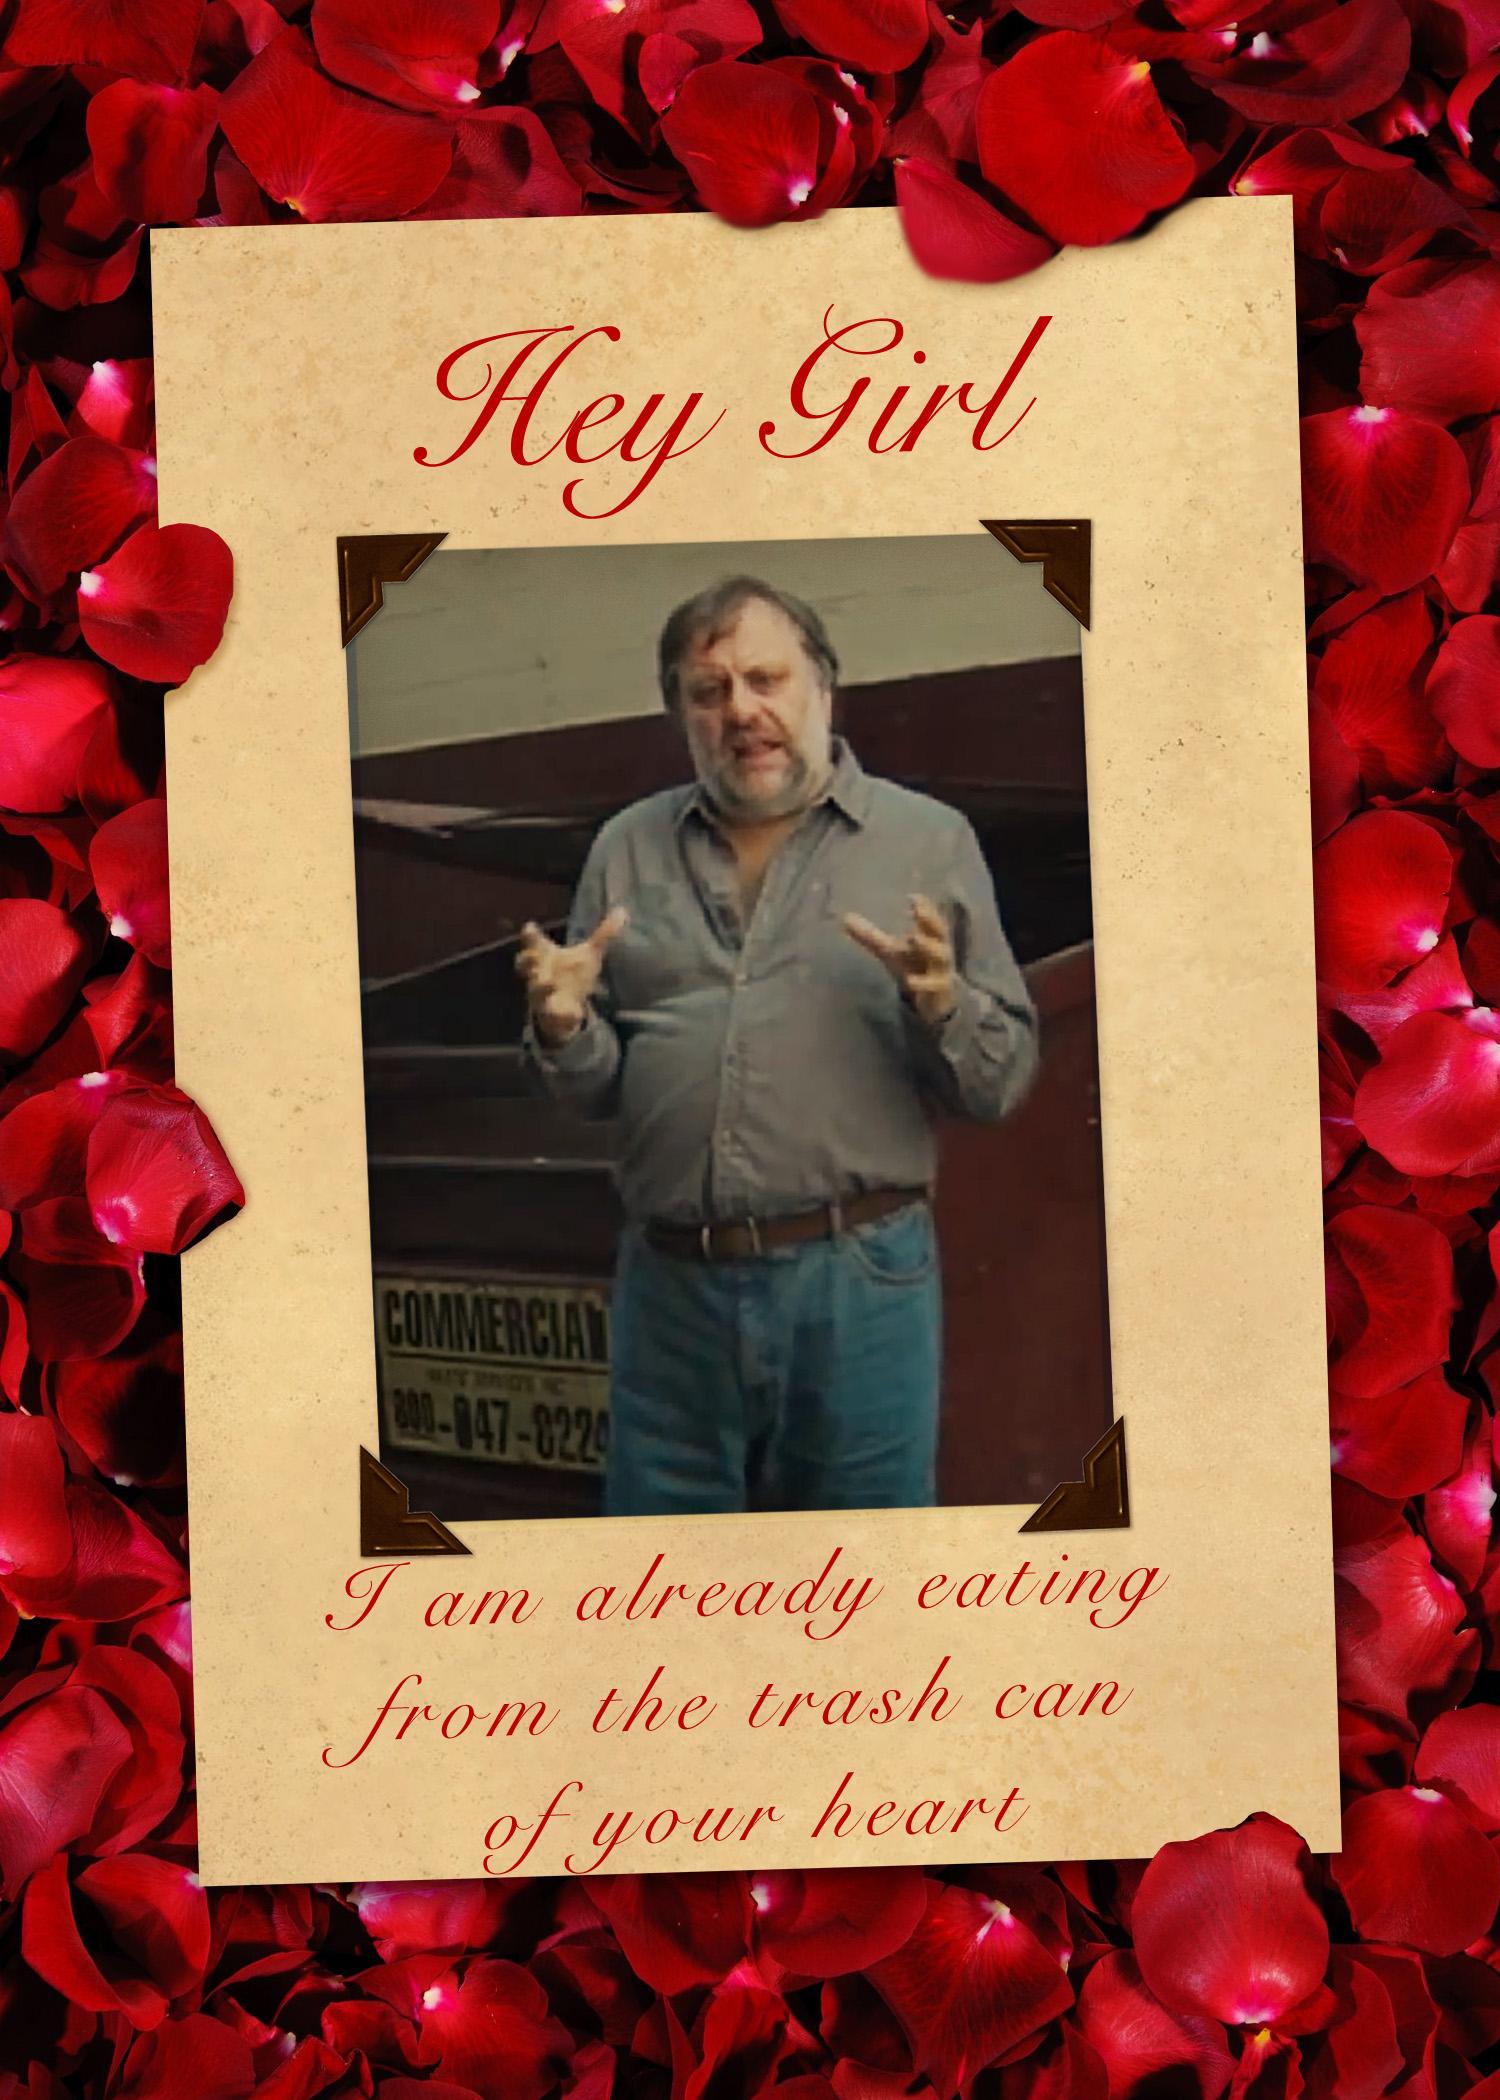 Slavoj Zizek Valentine Card Trash Can  CriticalTheorycom